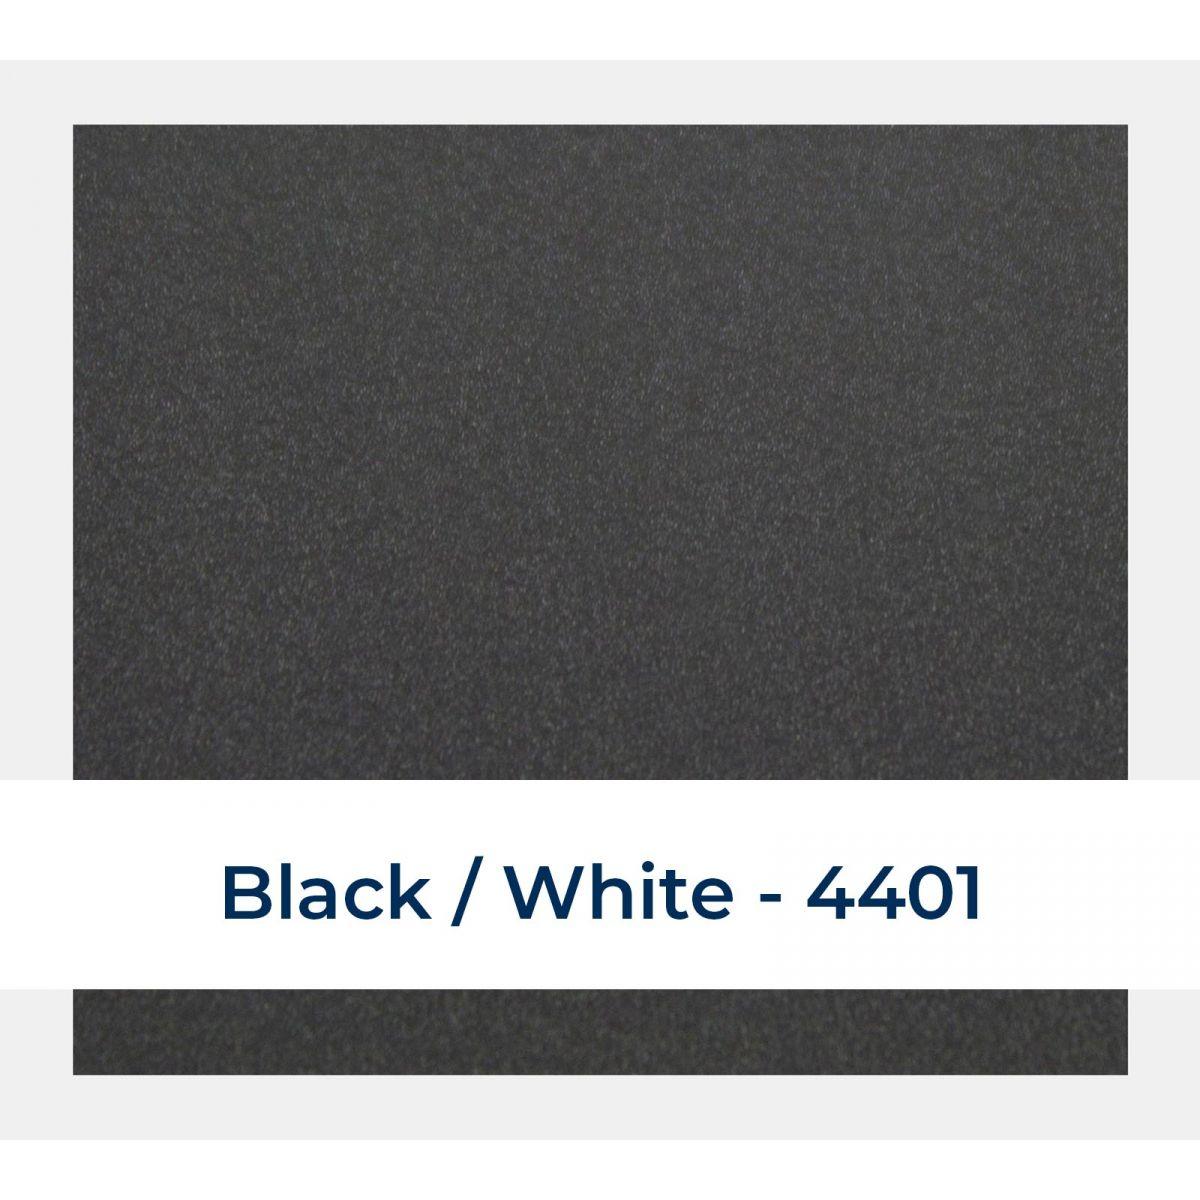 Duoflex Black / White 4401